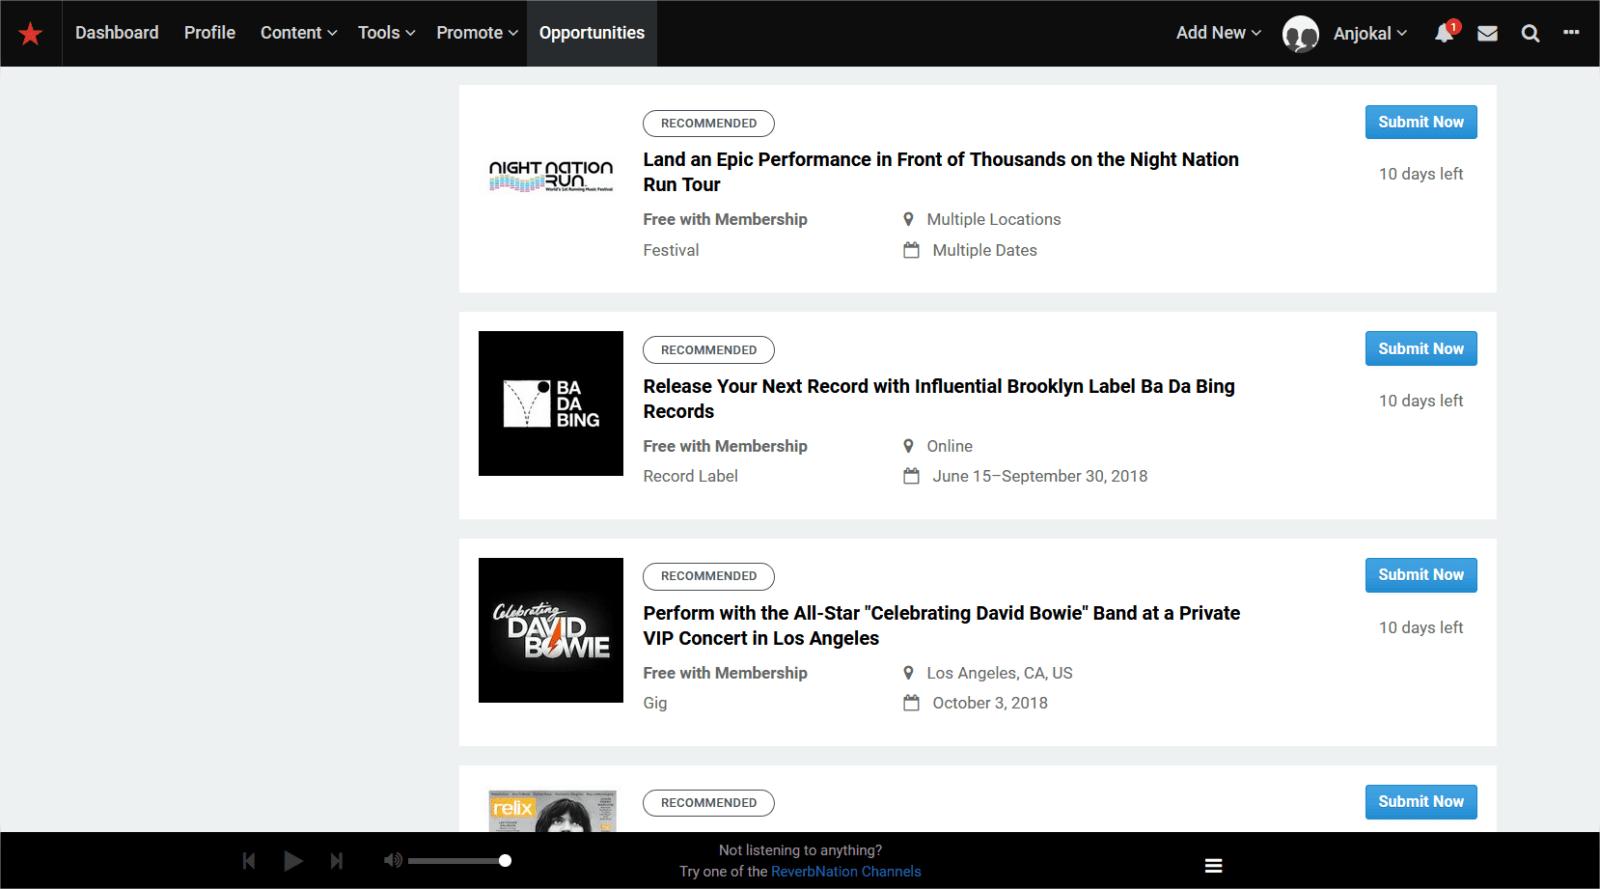 Descubra 25 sites para download de musica gratis legalmente 16